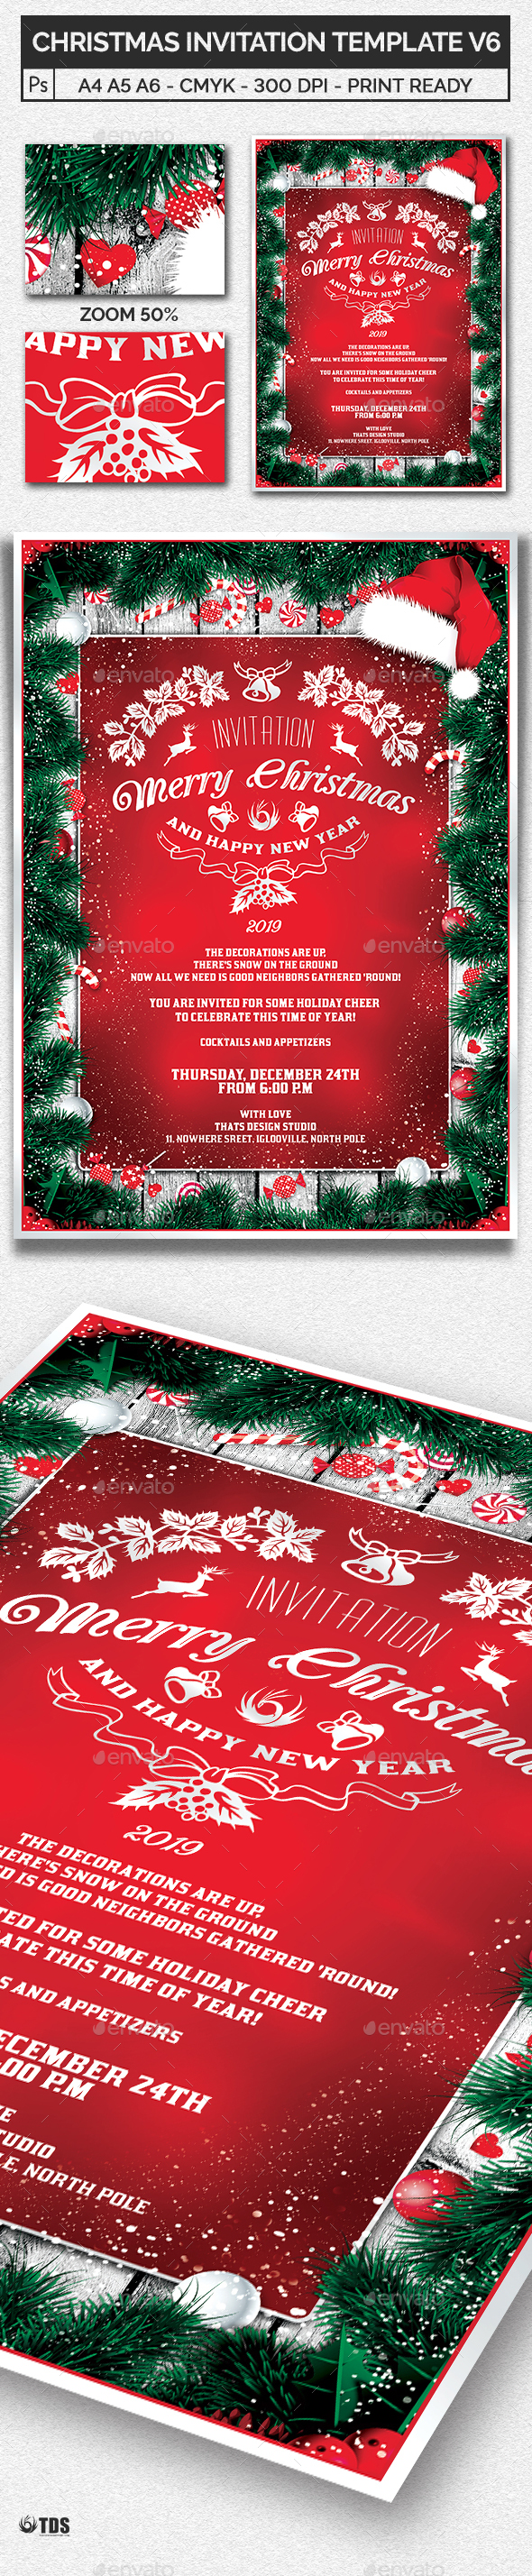 Christmas Invitation Template V6 - Invitations Cards & Invites